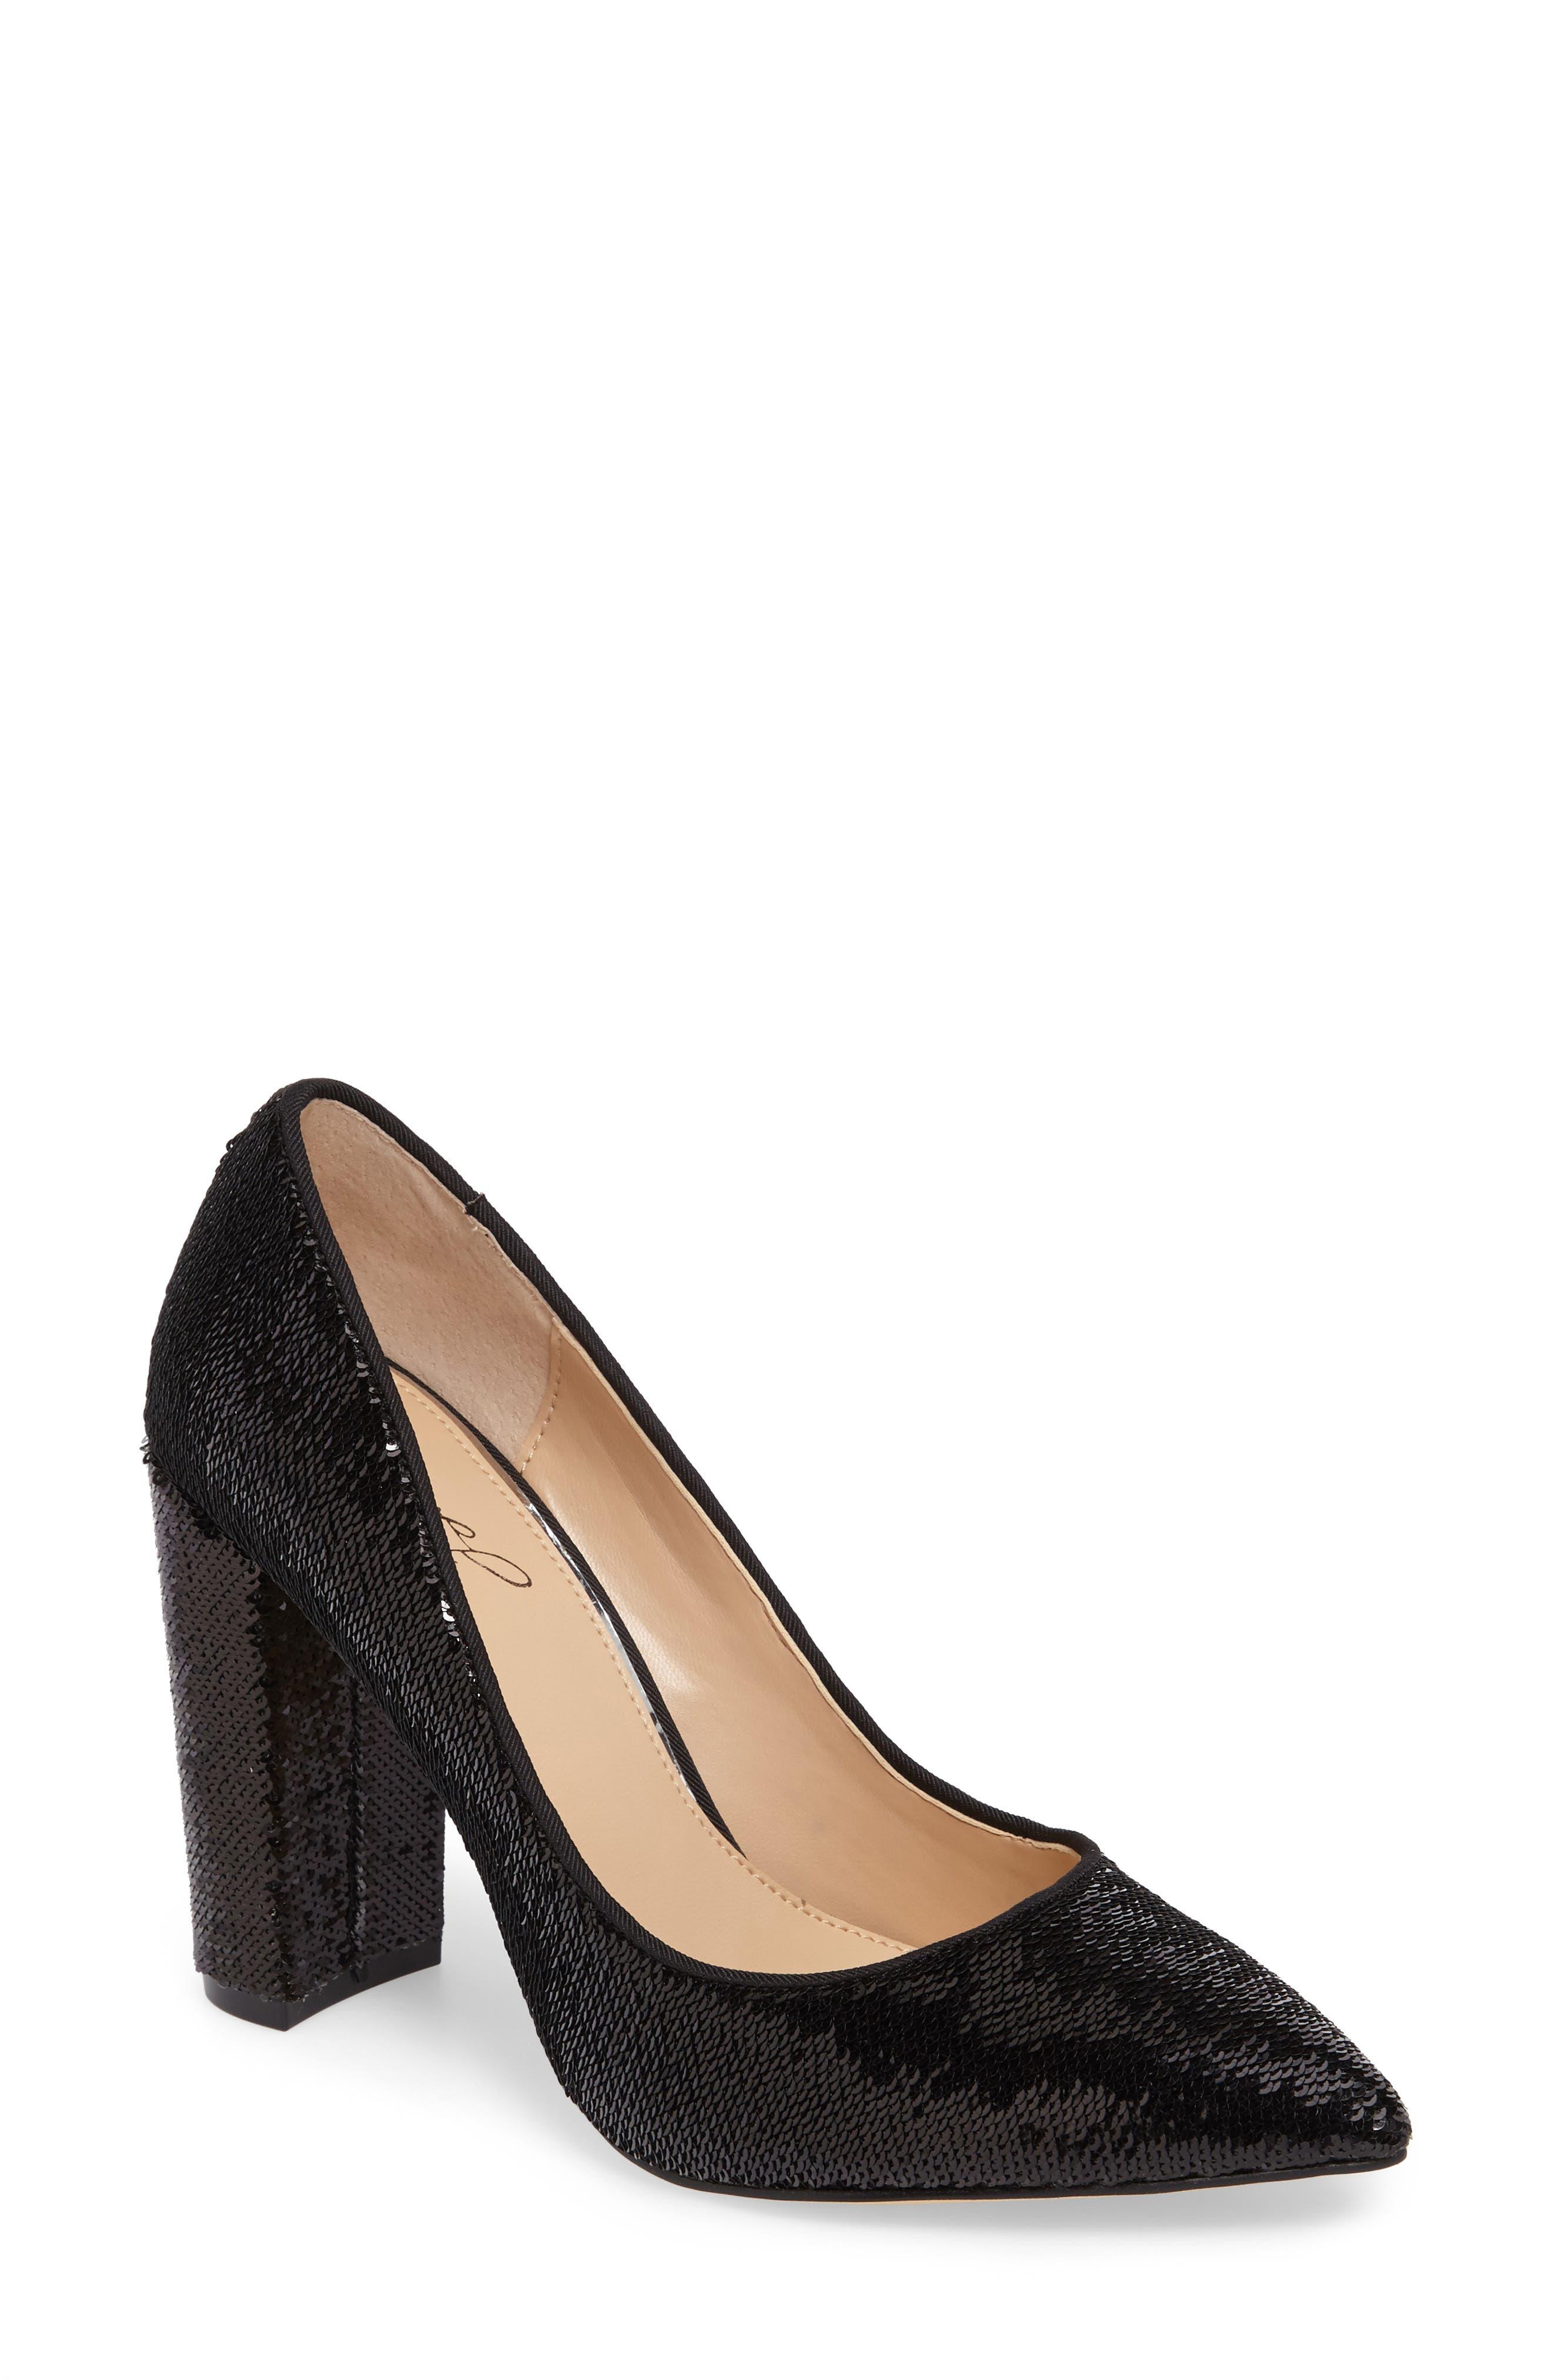 Jewel Badgley Mischka Luxury Pointy Toe Pump (Women)